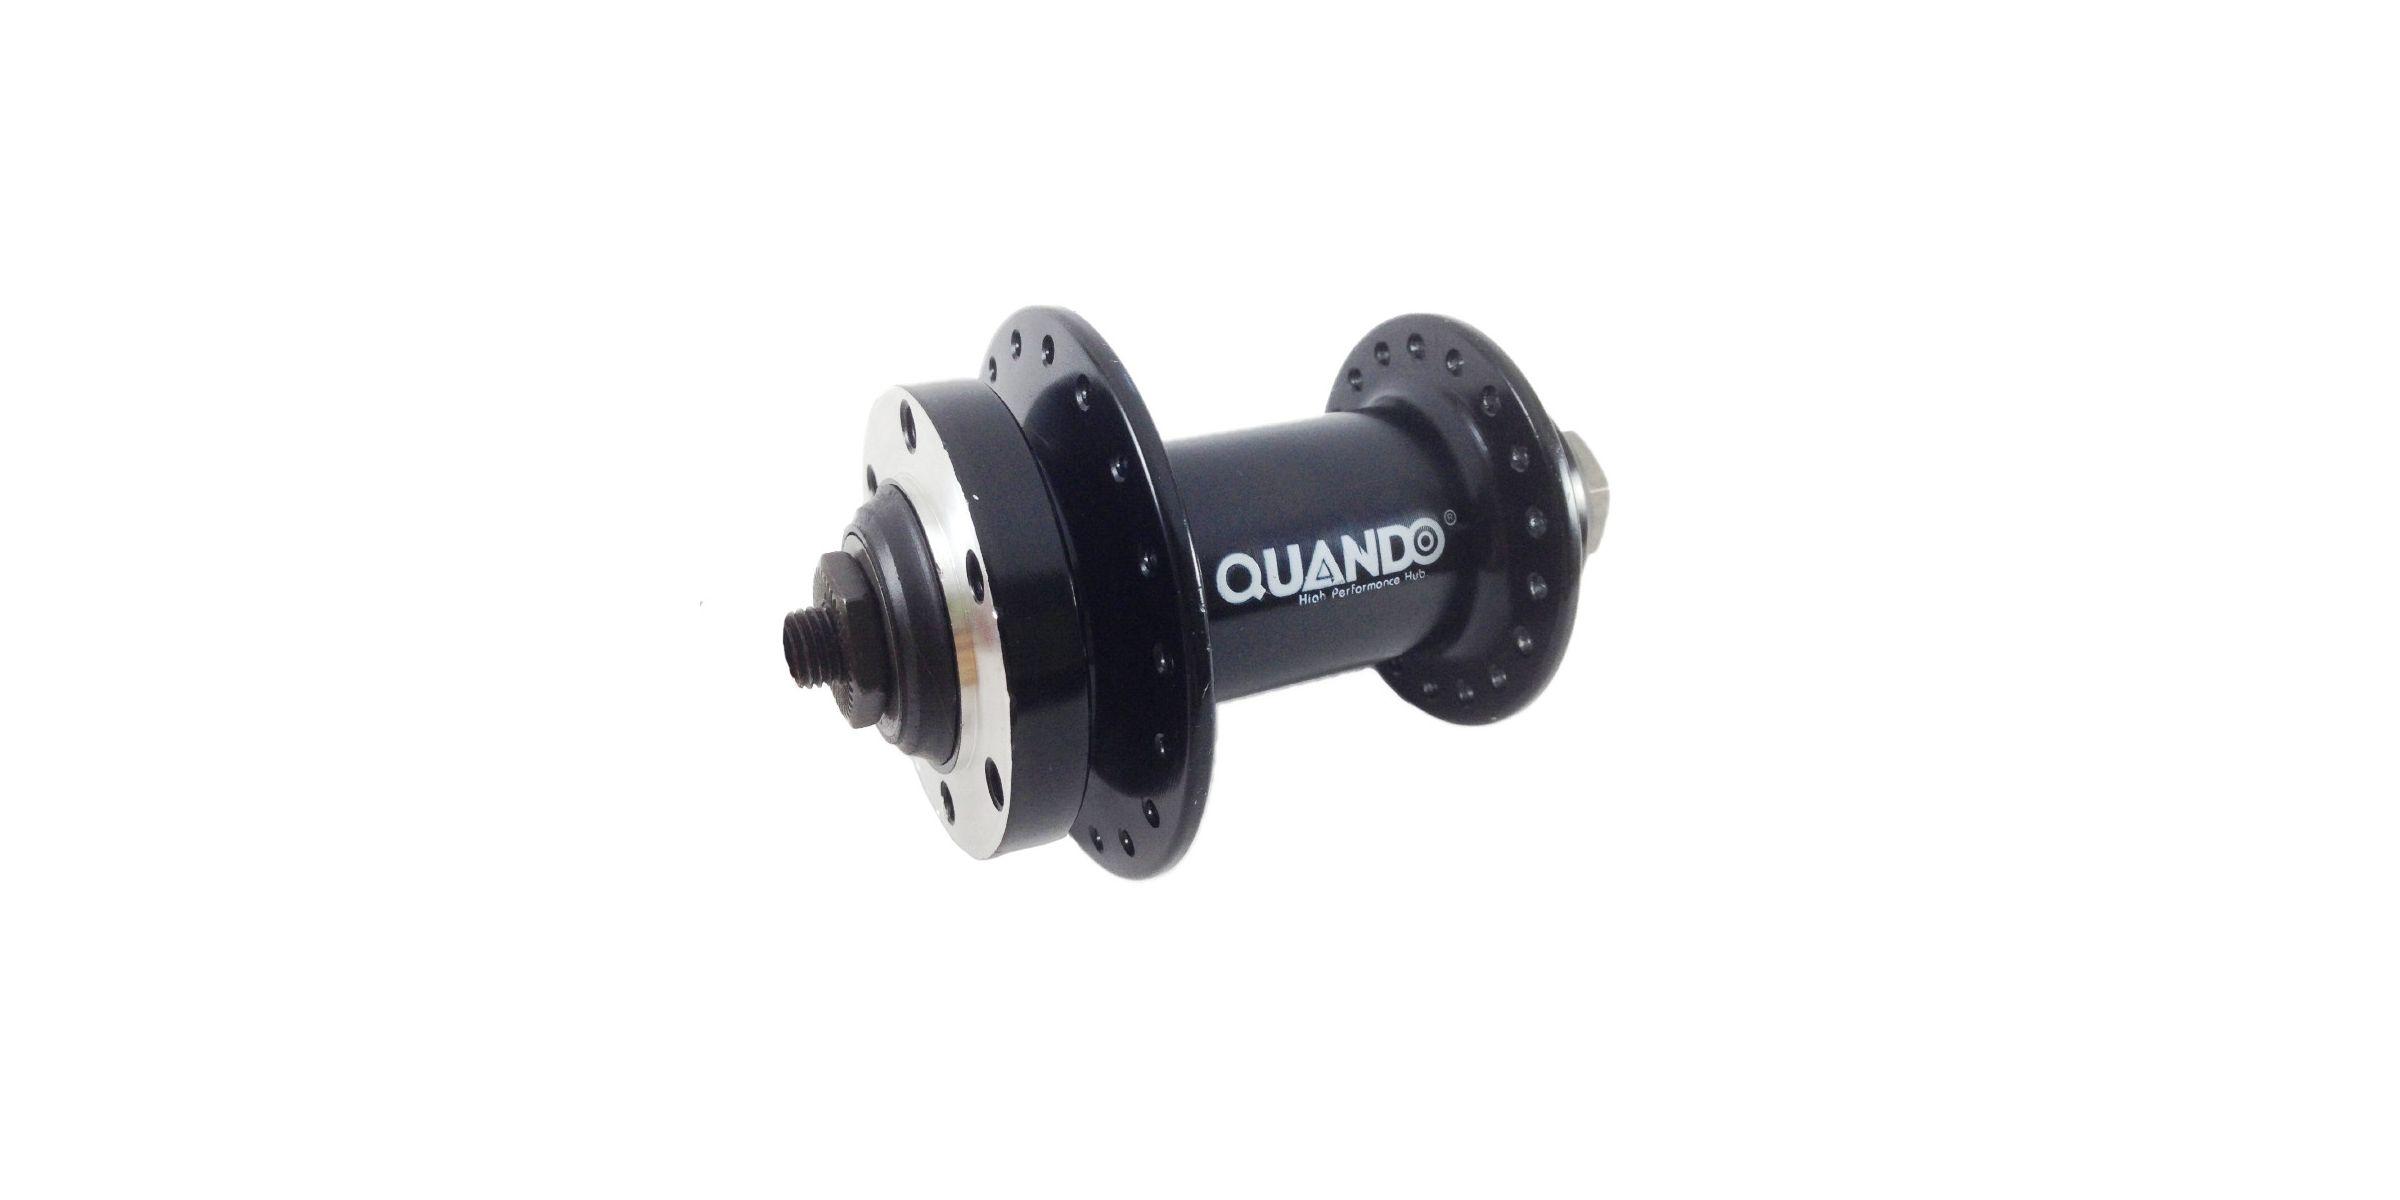 Втулка передняя QUANDO KT-TD7F PSP-0050